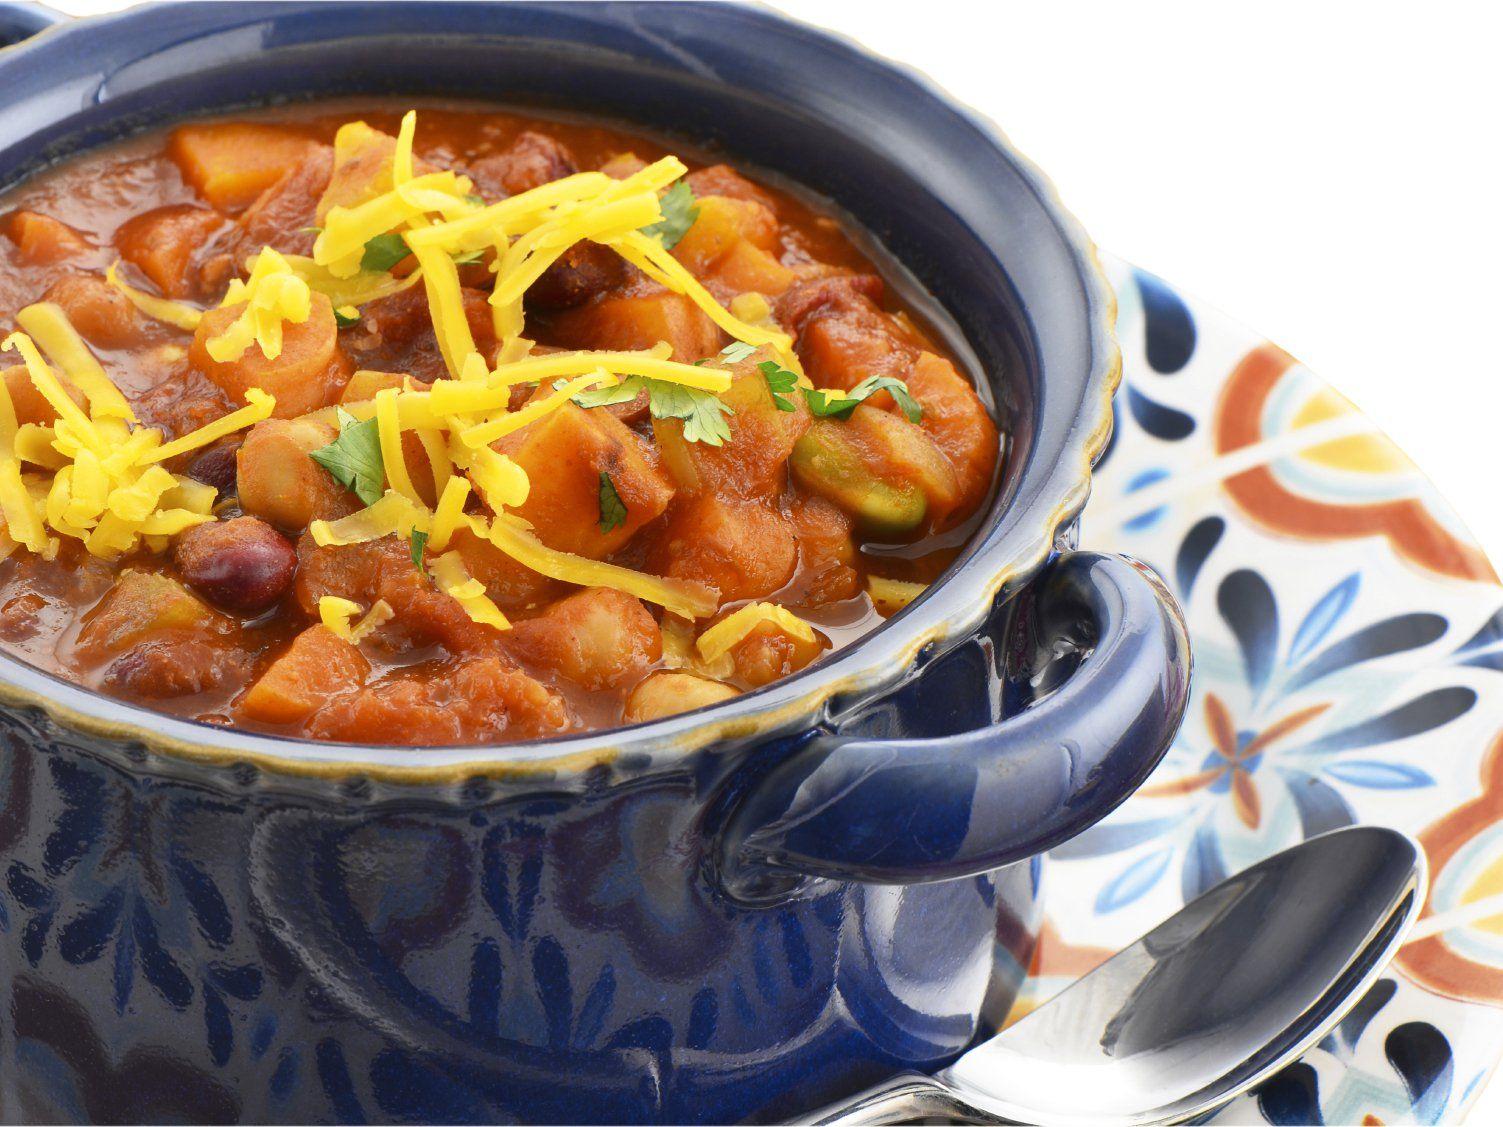 Chili De Tofu Epice A La Mangue Recipe Slow Cooker Vegetarian Chili Recipes Sweet Potato Chili Vegetarian